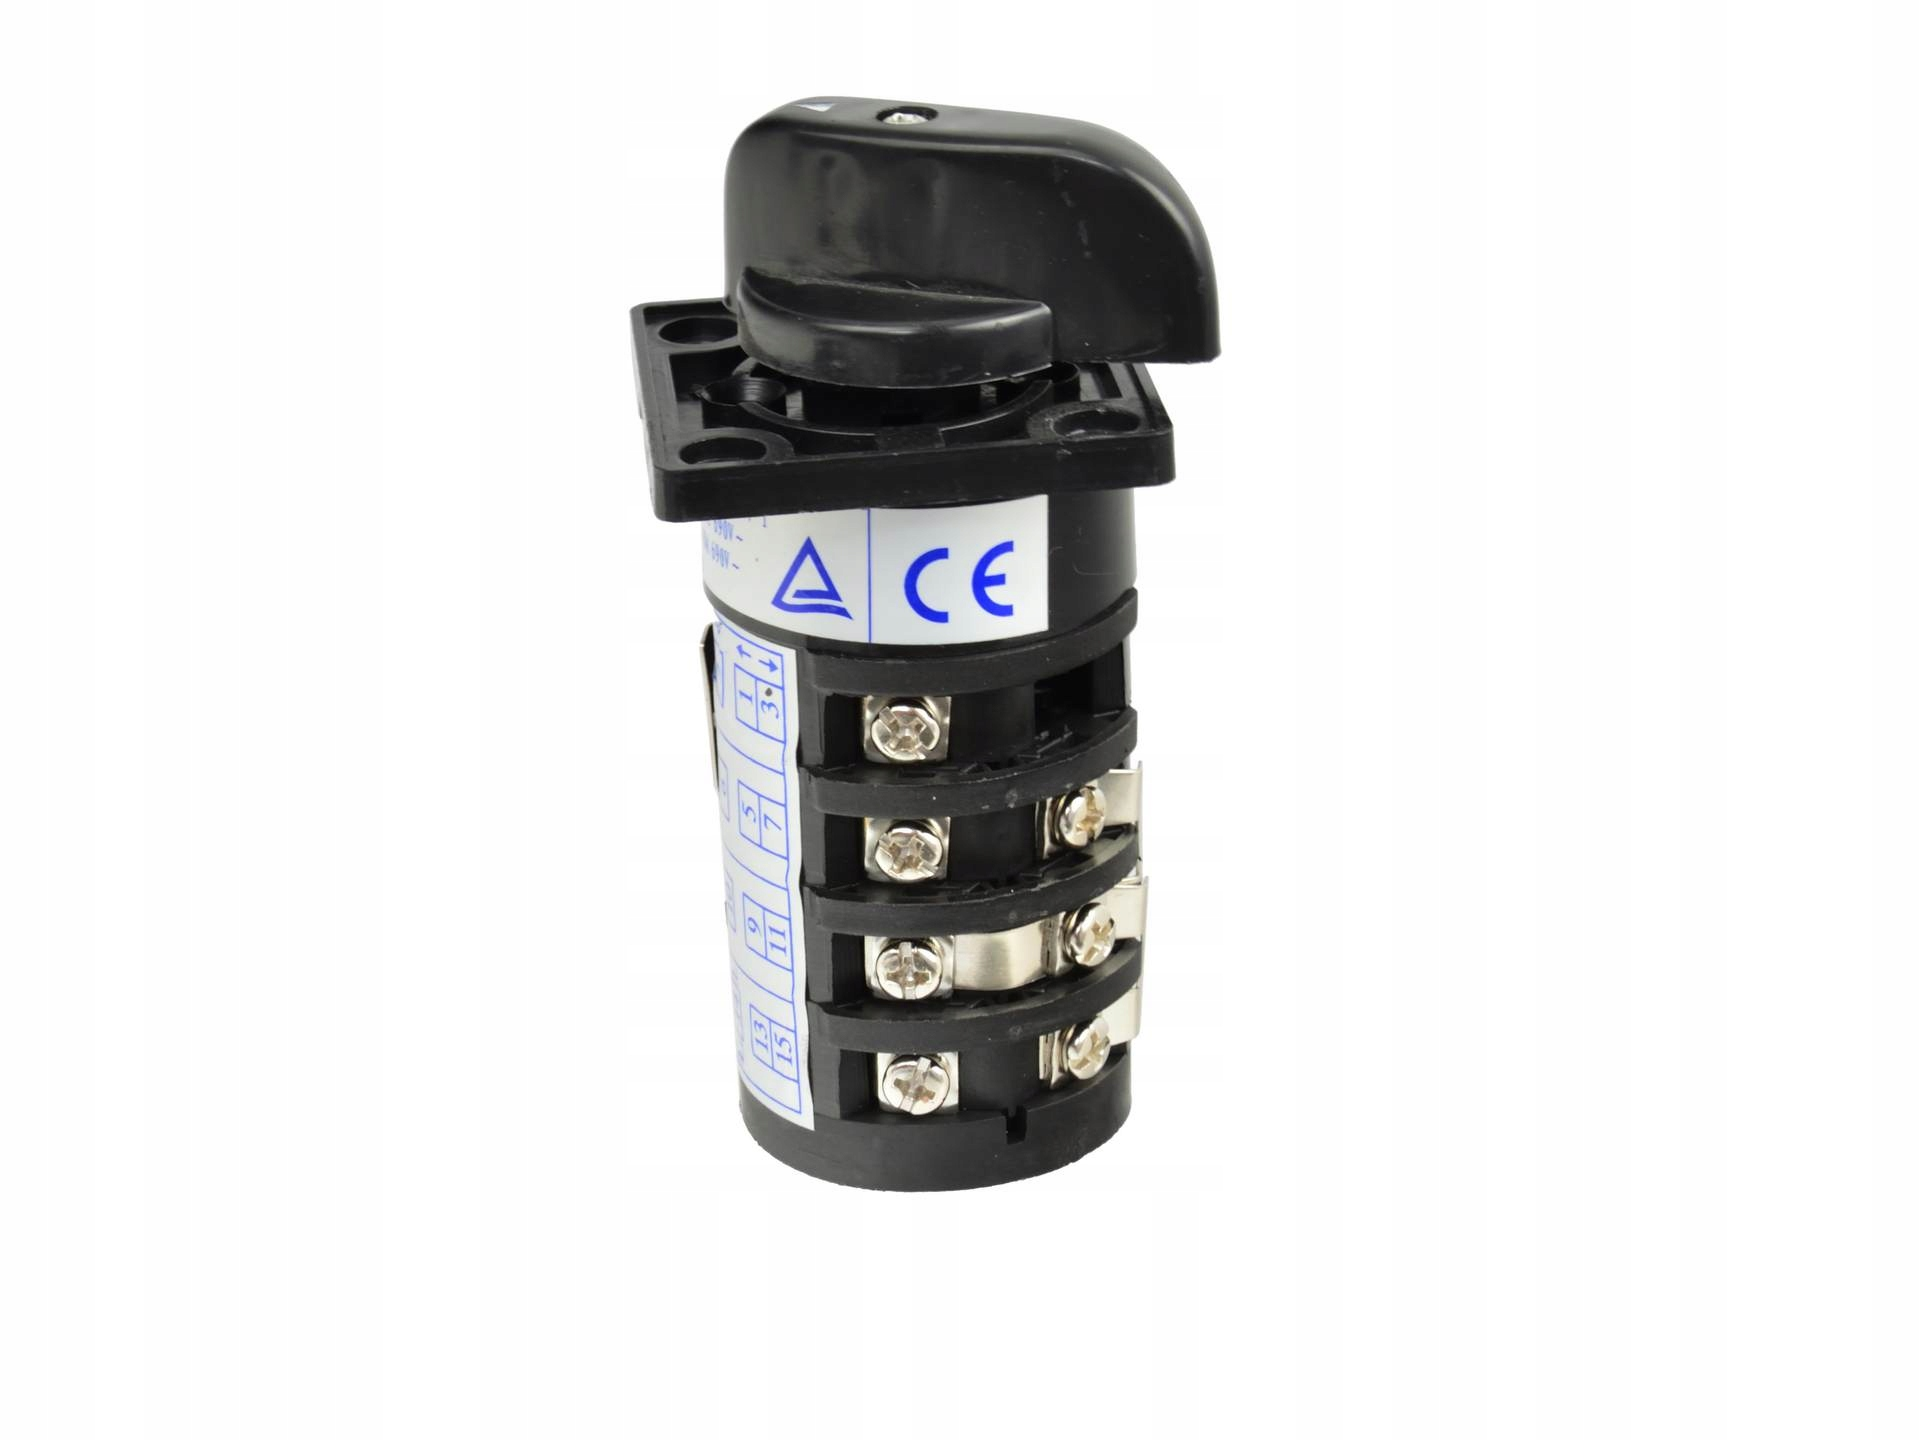 Выключатель, выключатель, сварочный аппарат HZ5B-20/4 3 Pos